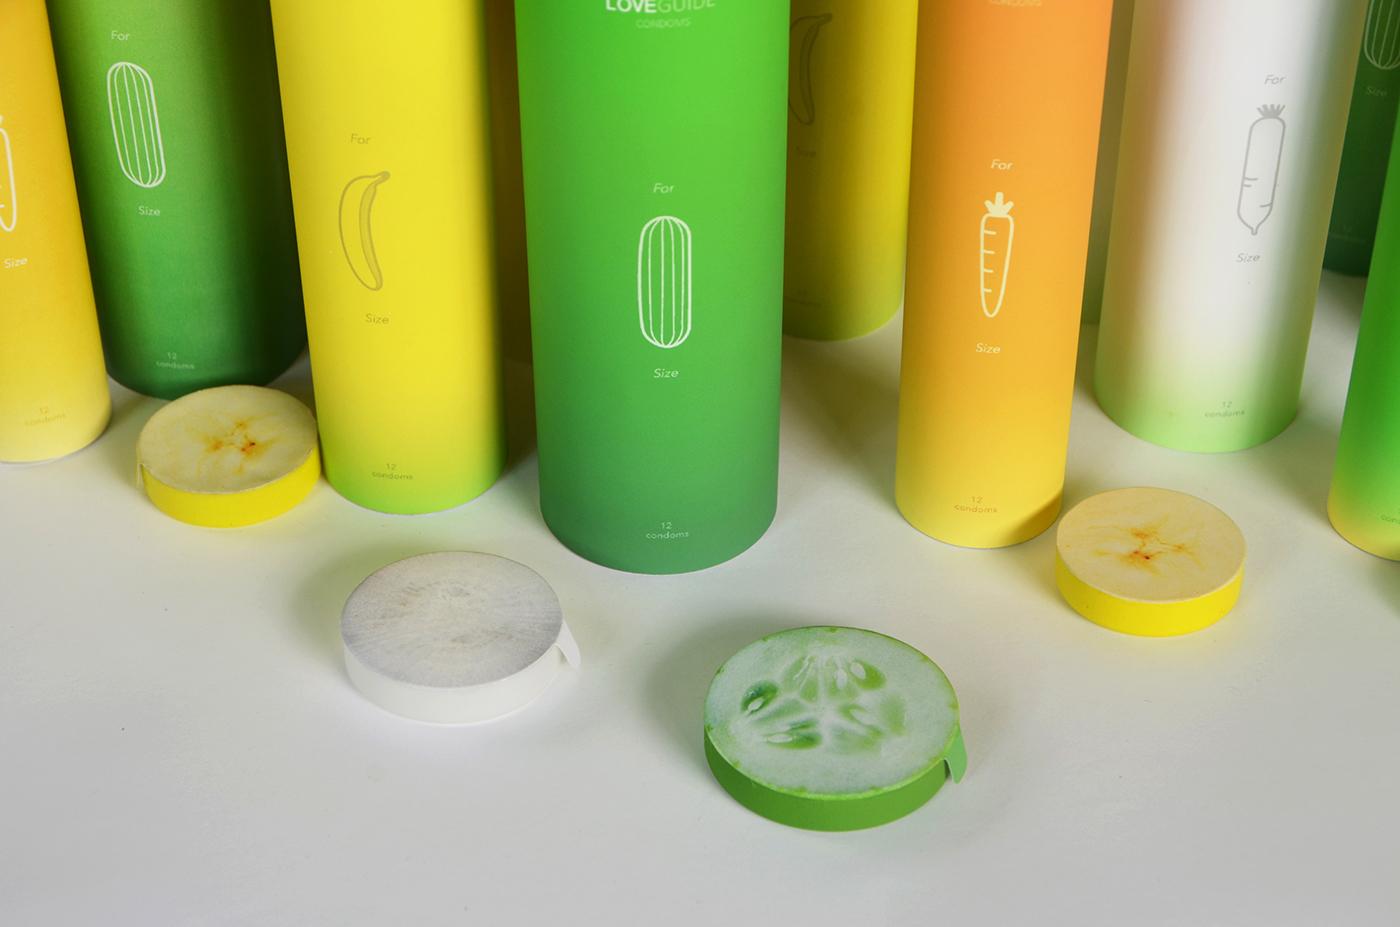 adaa_2015,adaa_school ot,adaa_country taiwan,adaa_packaging,CONDOM,vending machine,size,healthy,universal design,Easy Production,protection,adaa_social_impact_design